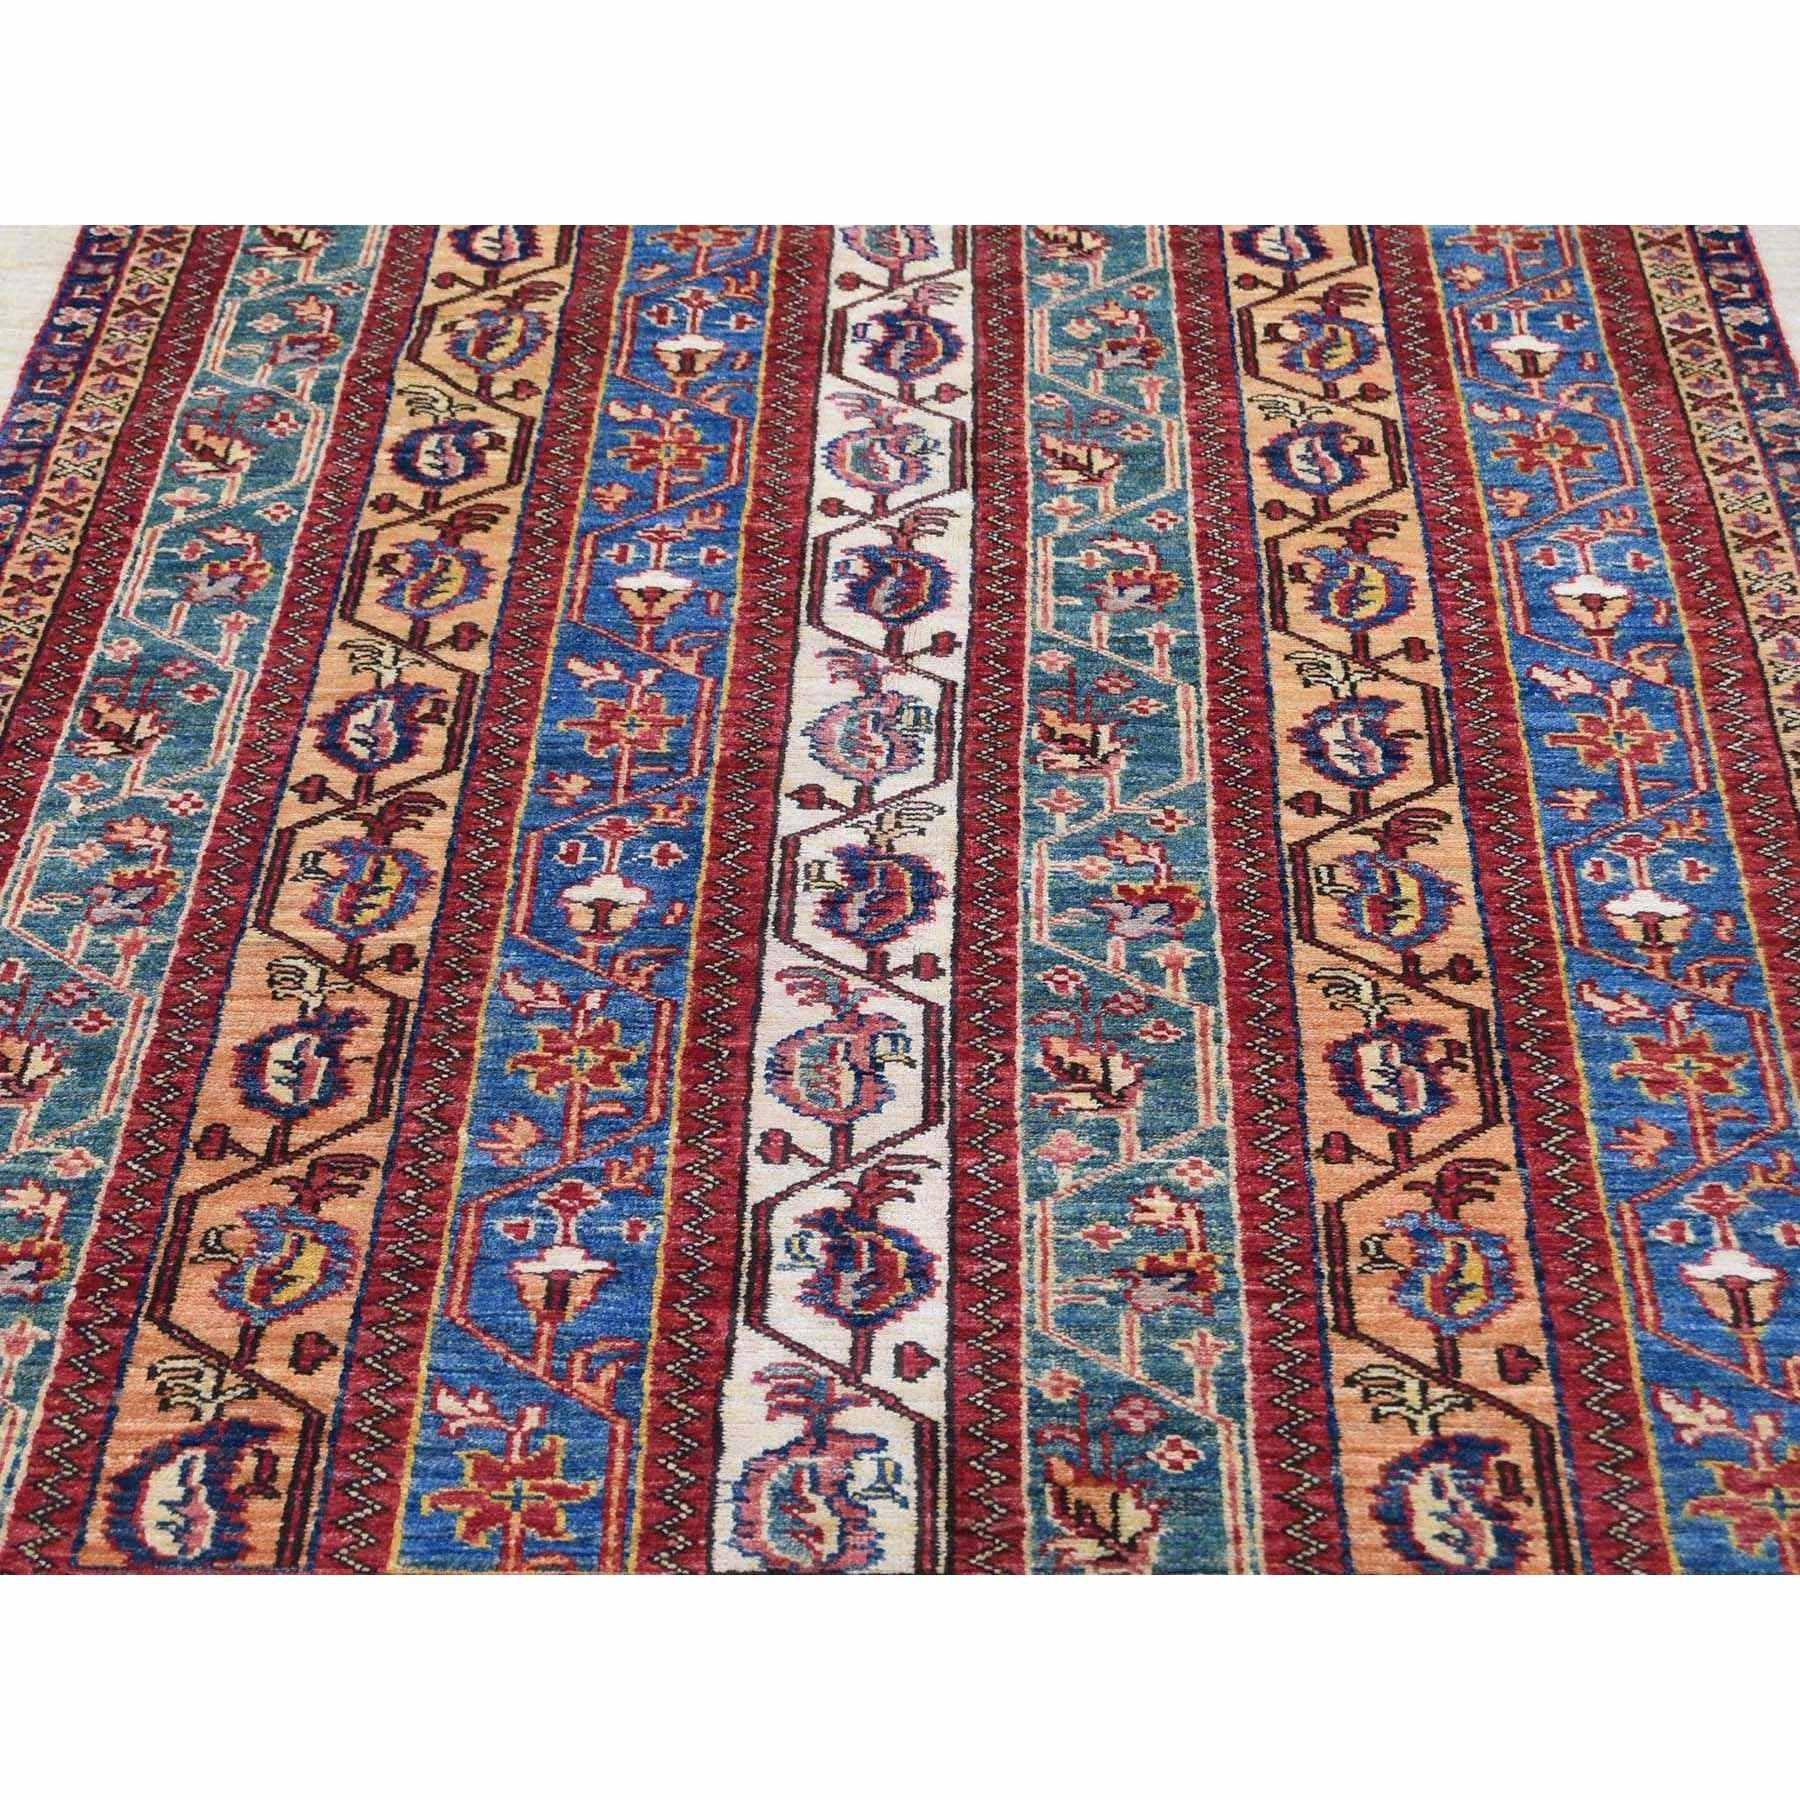 "4'9""x6'8"" Multicolored Super Kazak Shawl Design Pure Wool Hand-Knotted Oriental Rug"